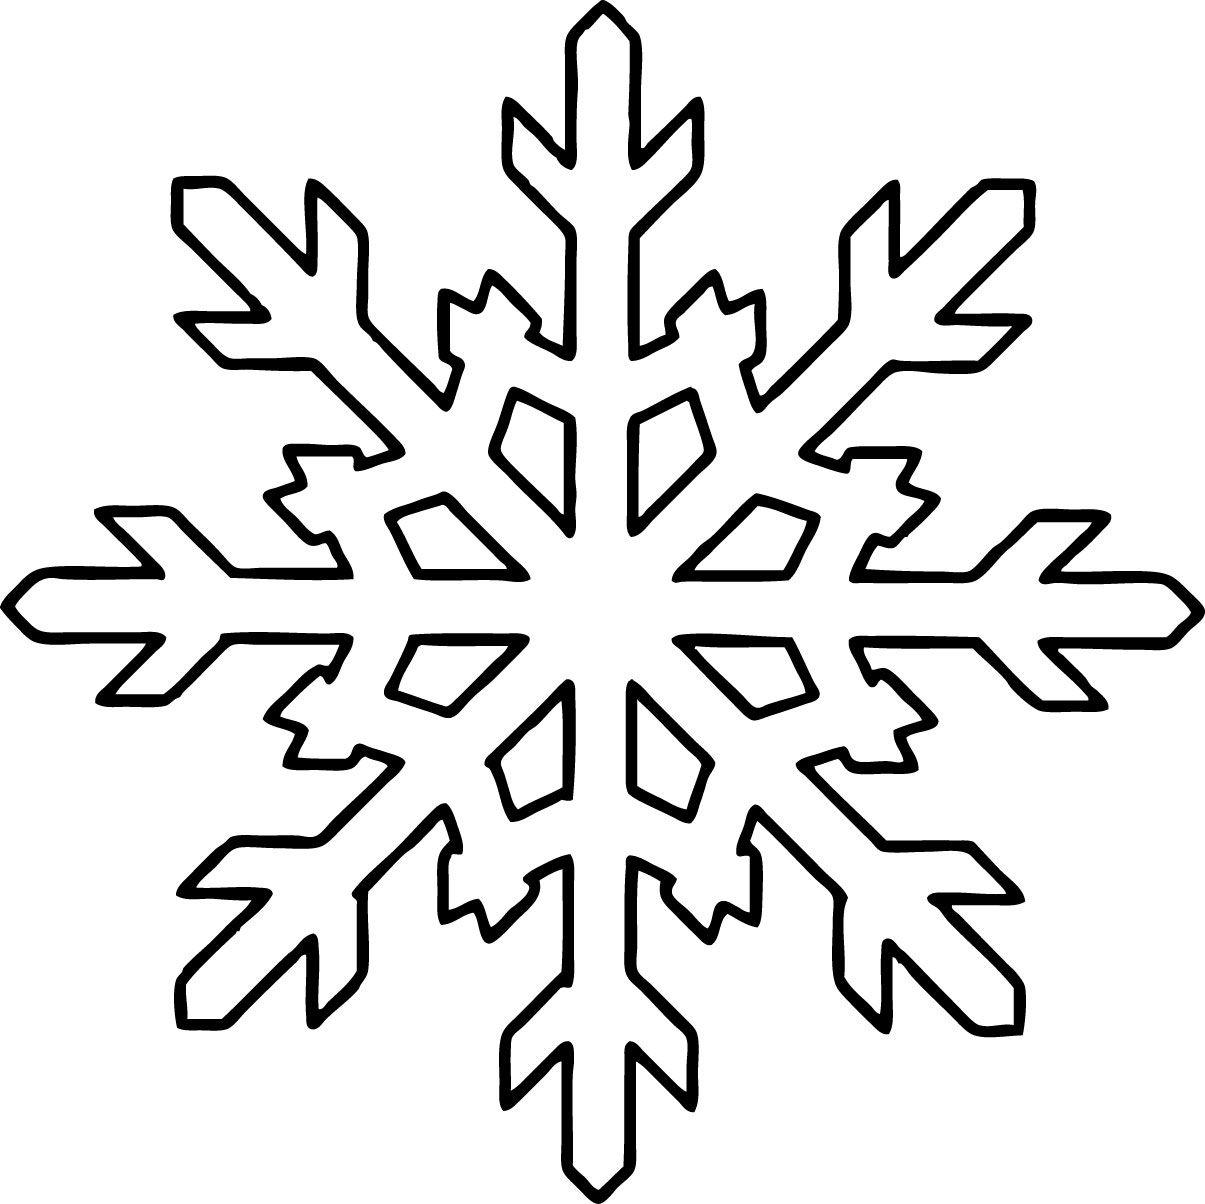 Snowflake Coloring Pages For Kids Printable Seasonal Pinterest